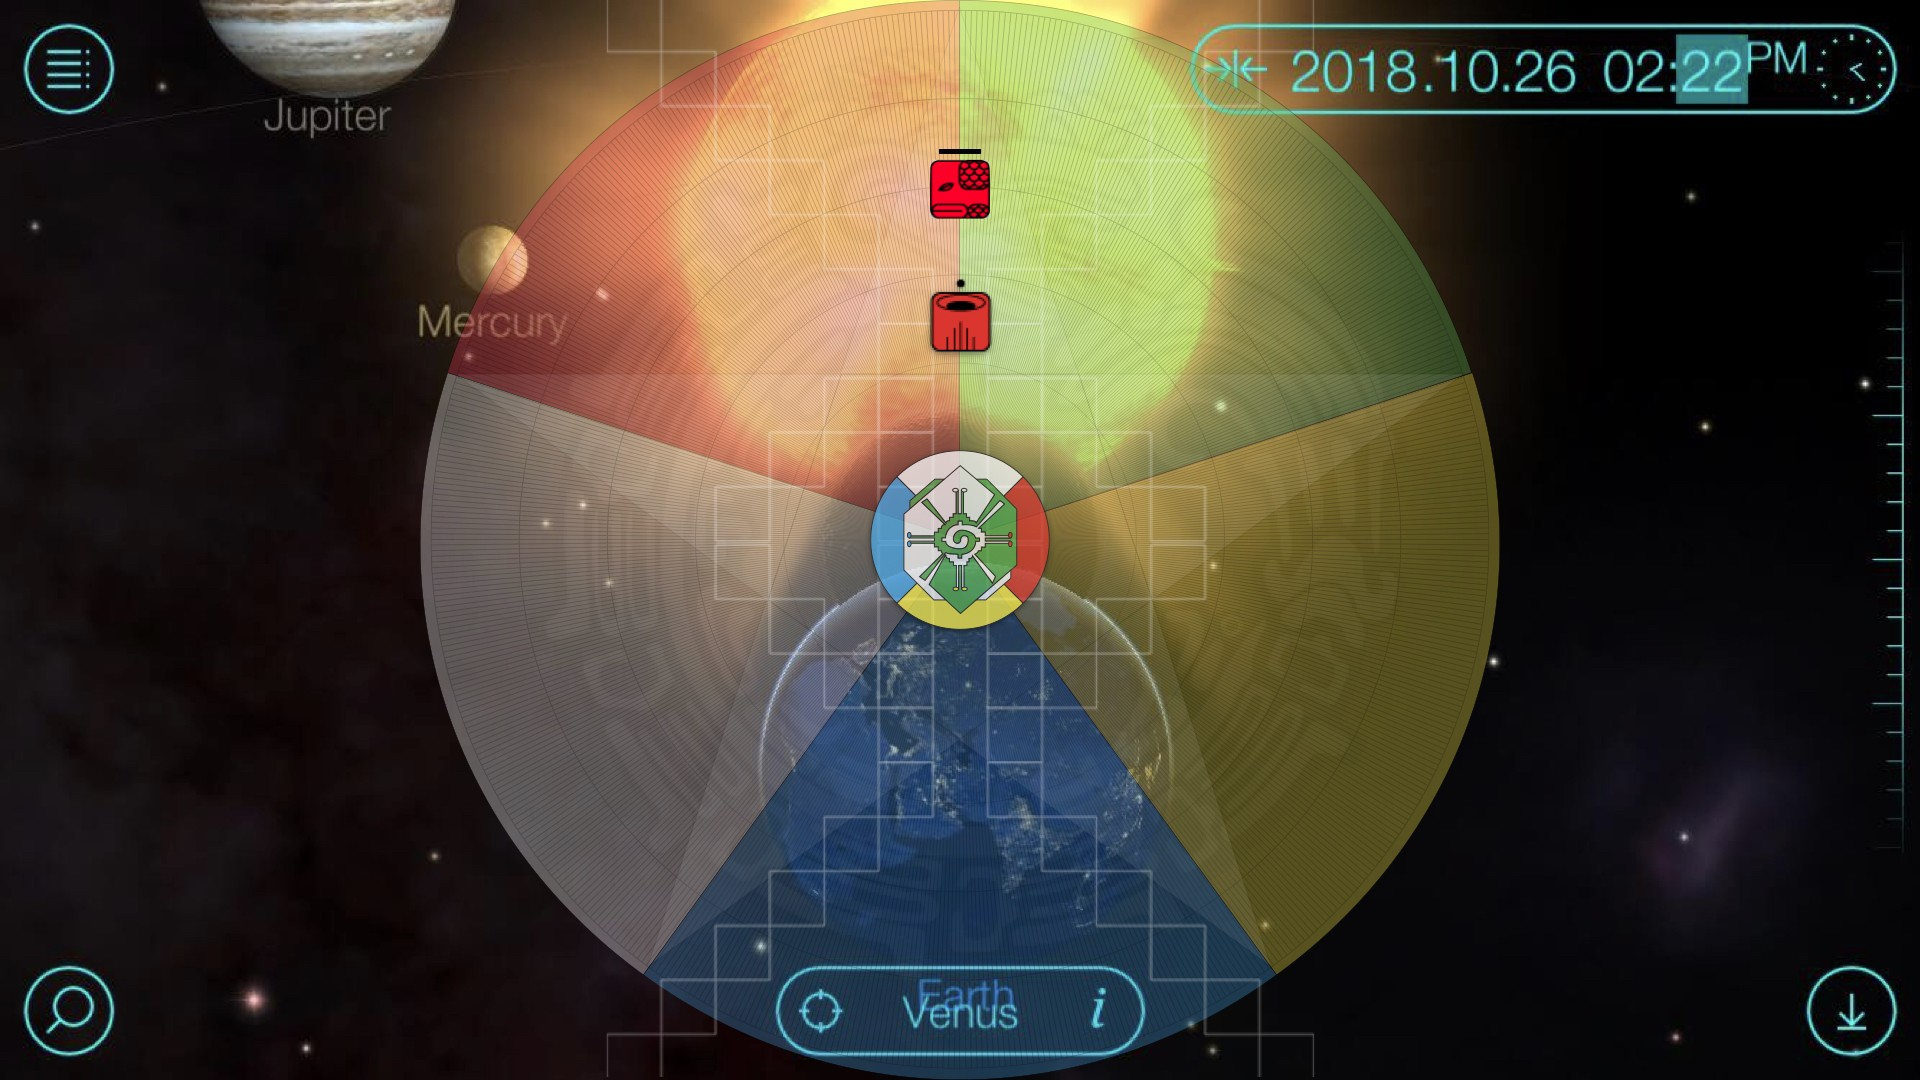 Calendario Lunar Zodiaco 2019 Recientes Noospheric Emergence Part Phive the Venus Factor – tortuga